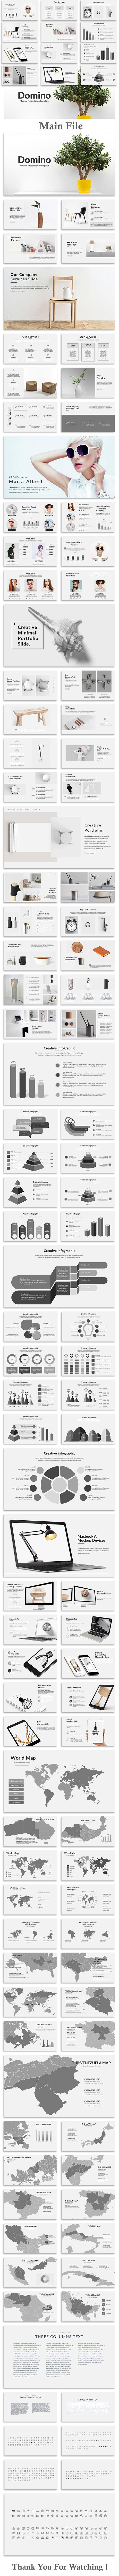 Domino - Minimal Google Slide Template - Google Slides Presentation Templates